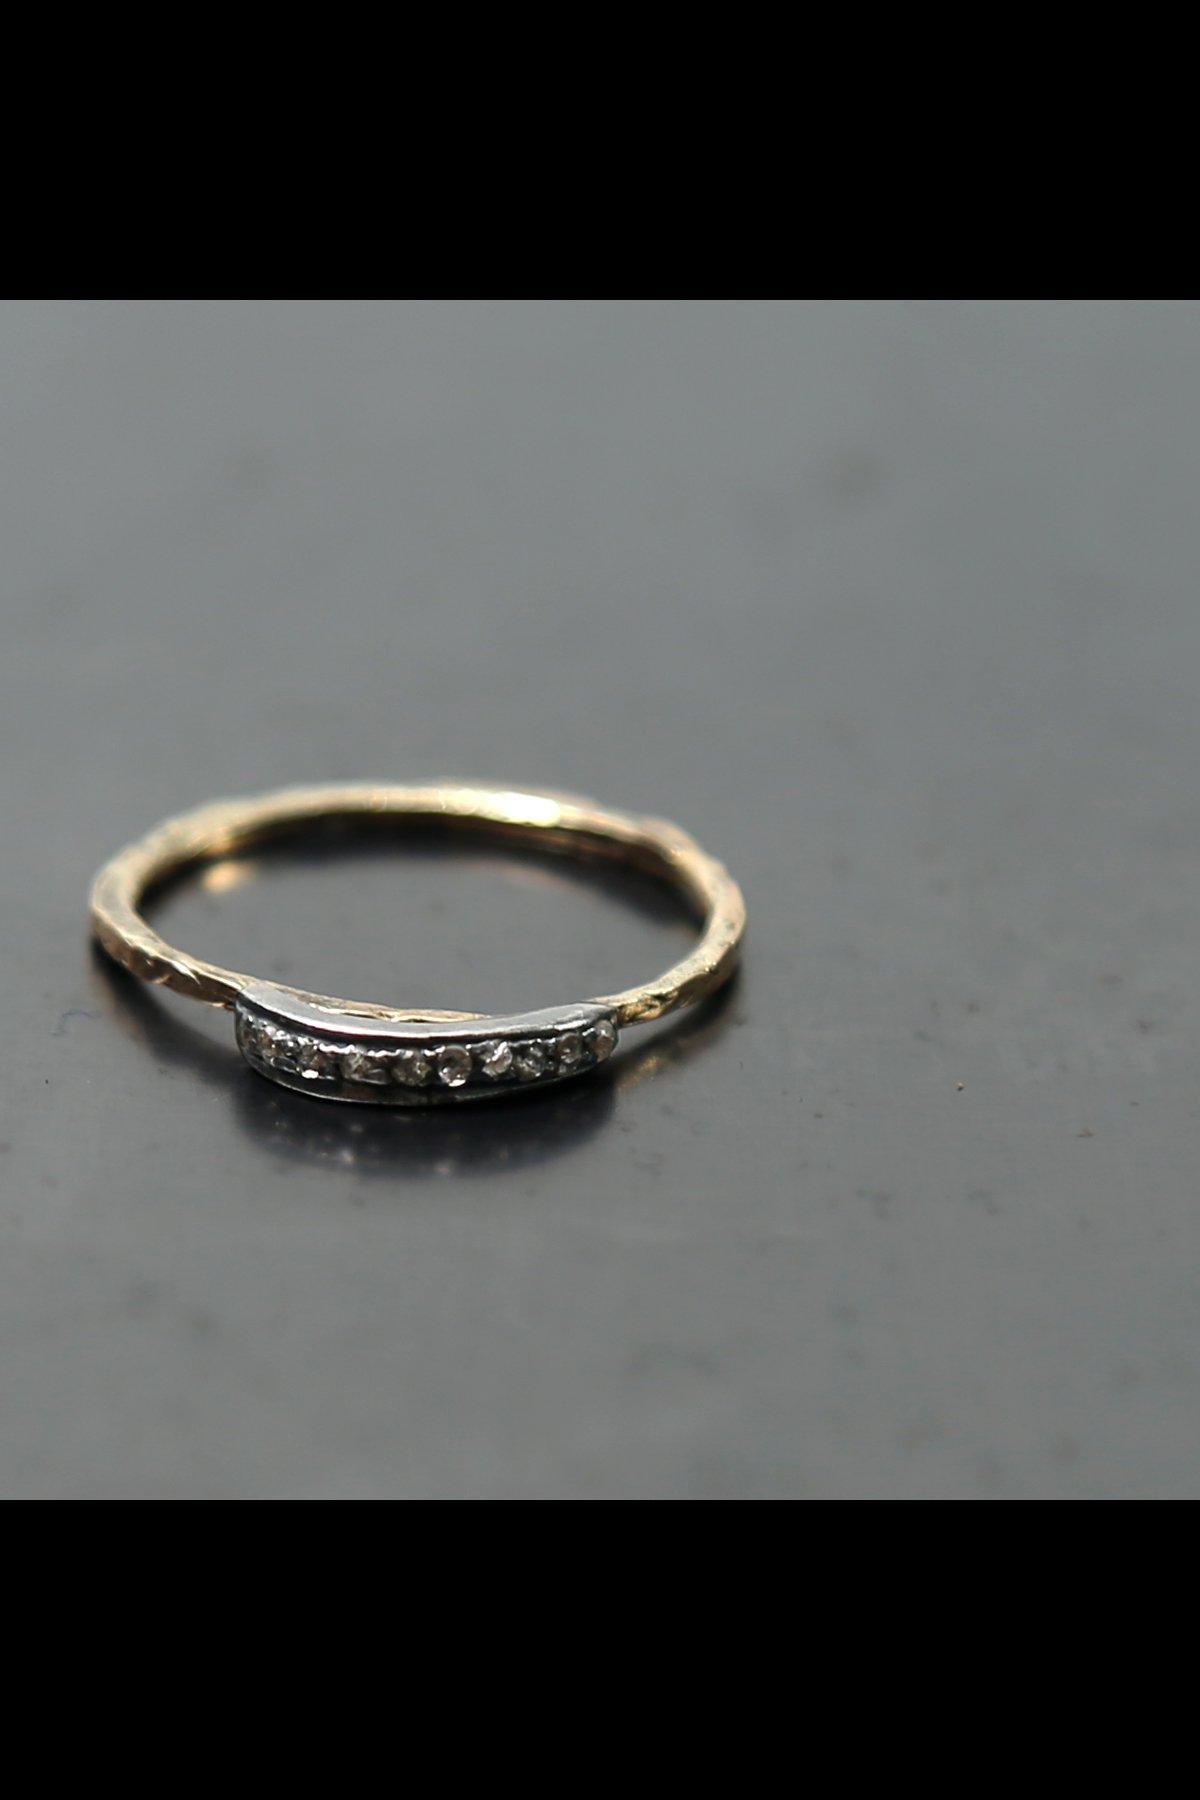 Pebbly Diamond Ring N.8S-OCTR2